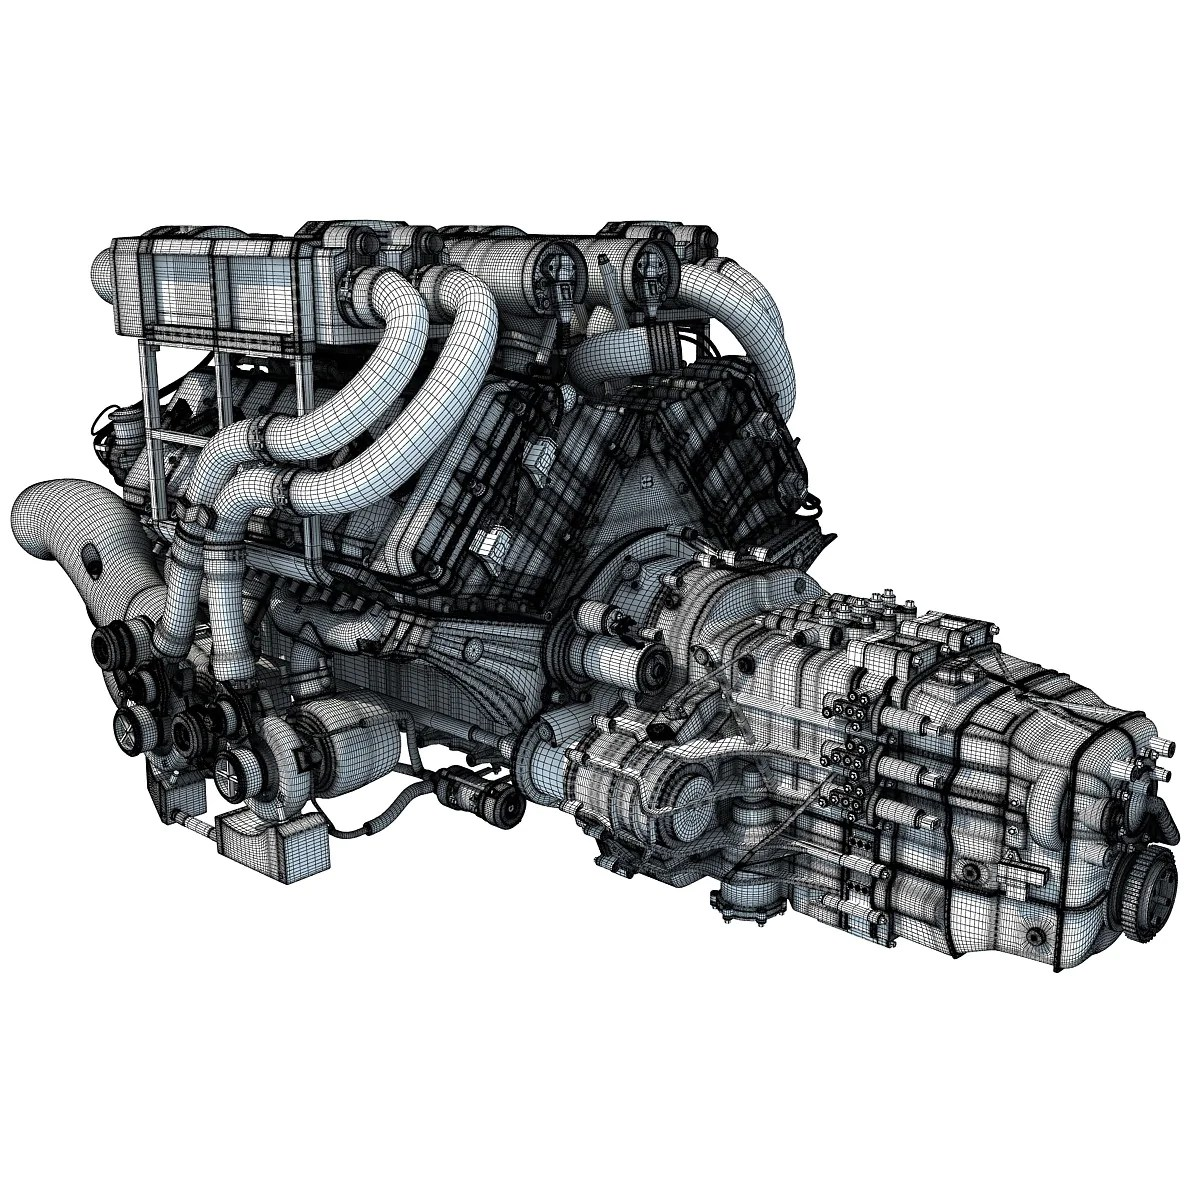 motor bugatti veyron w16 impremedia net bugatti veyron w16 engine animation bugatti veyron engine diagram [ 1200 x 1200 Pixel ]